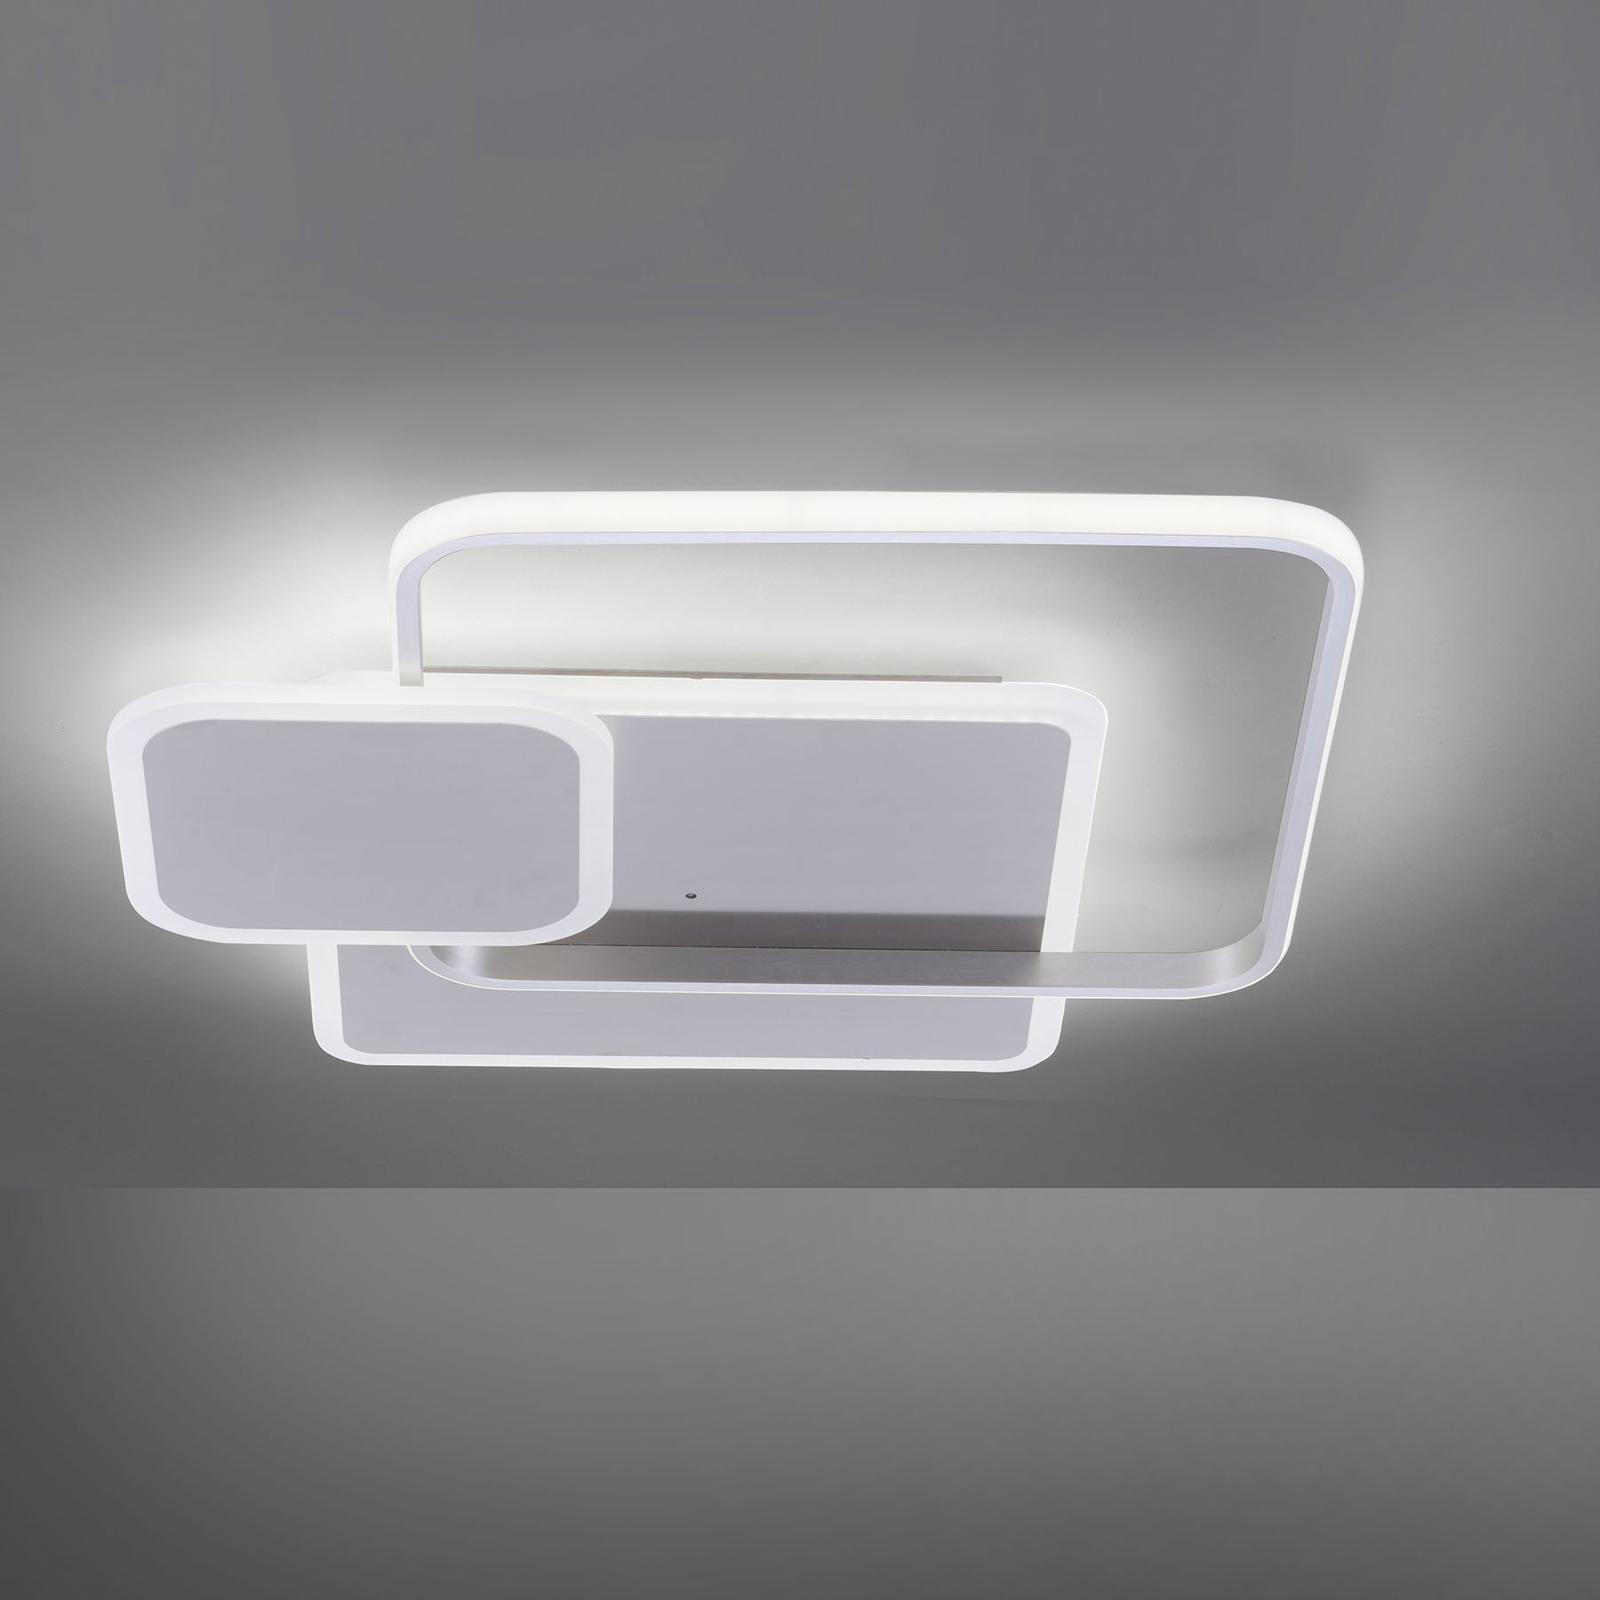 LED plafondlamp Emilio m.afstandsbediening, hoekig